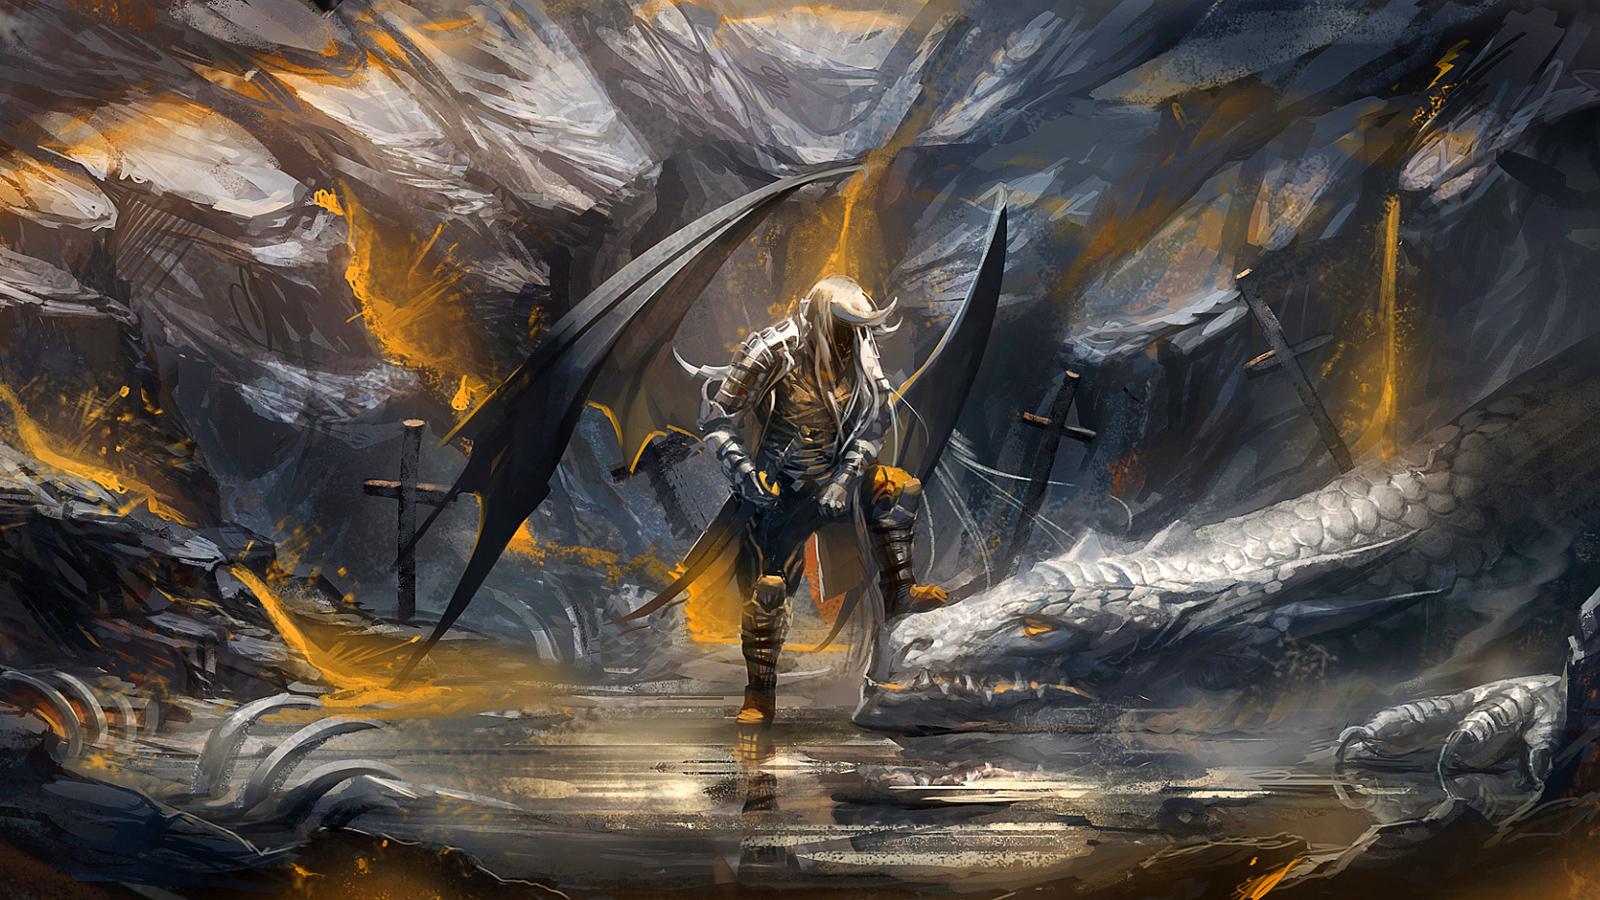 Dragonkin Art - ID: 52047 - Art Abyss